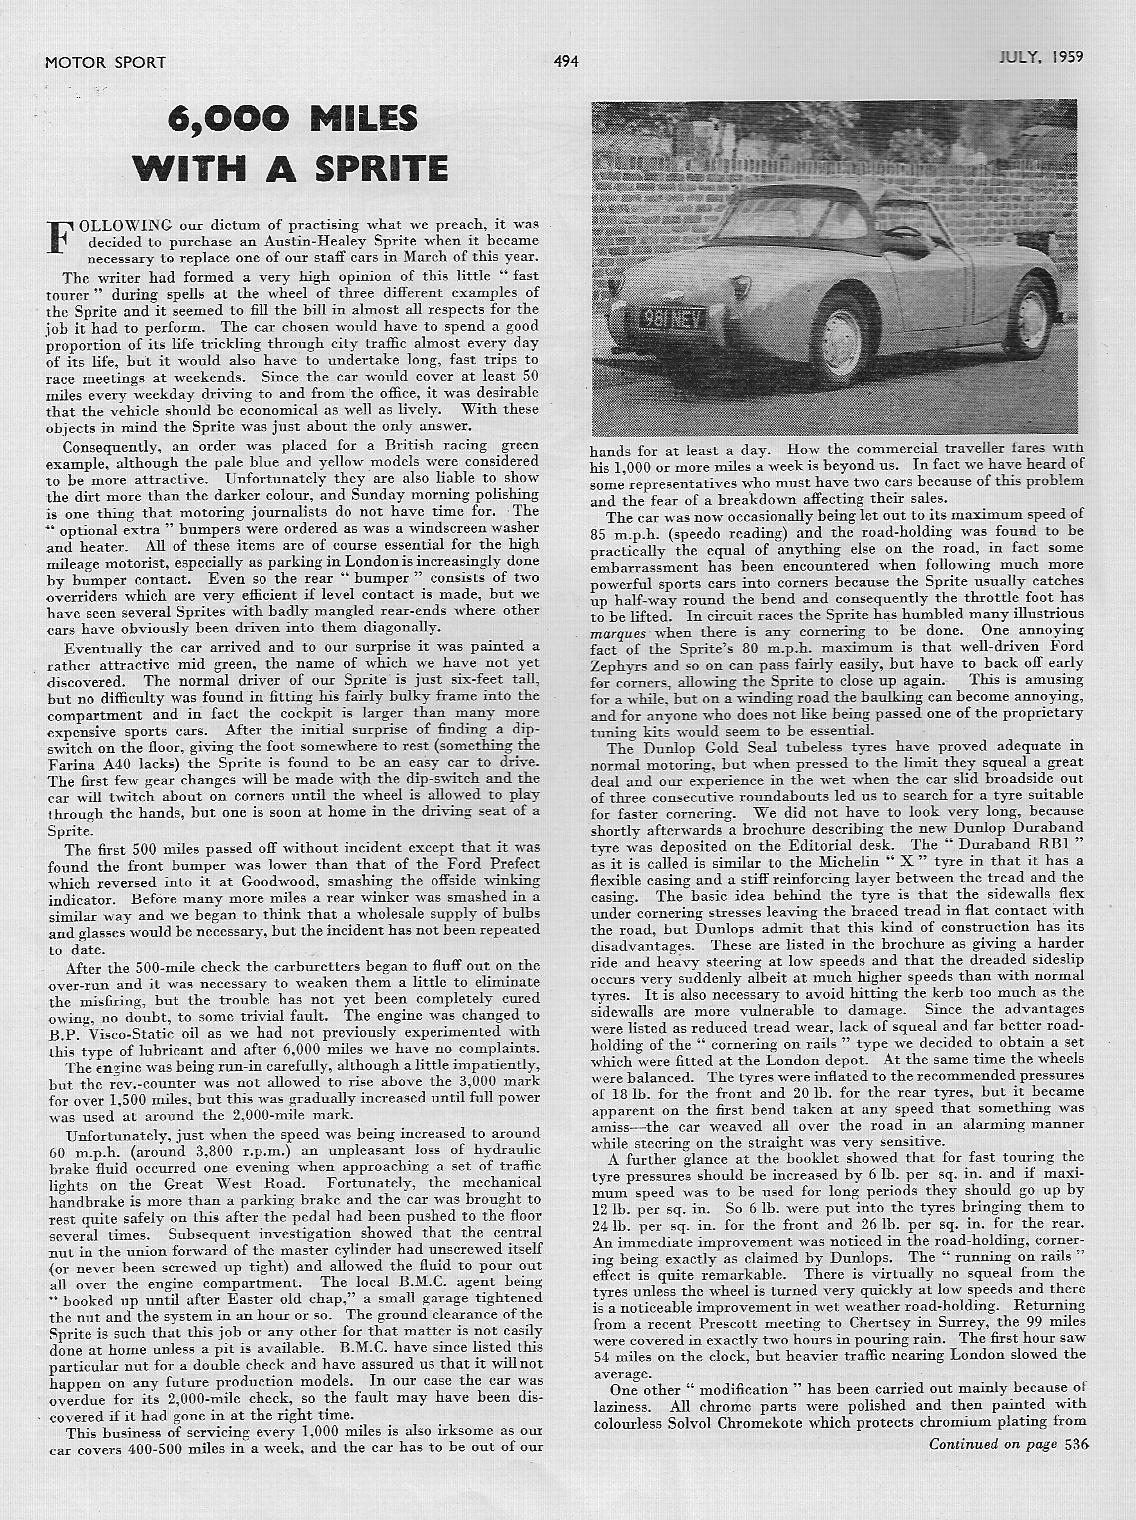 MotorSport 1959 July 2